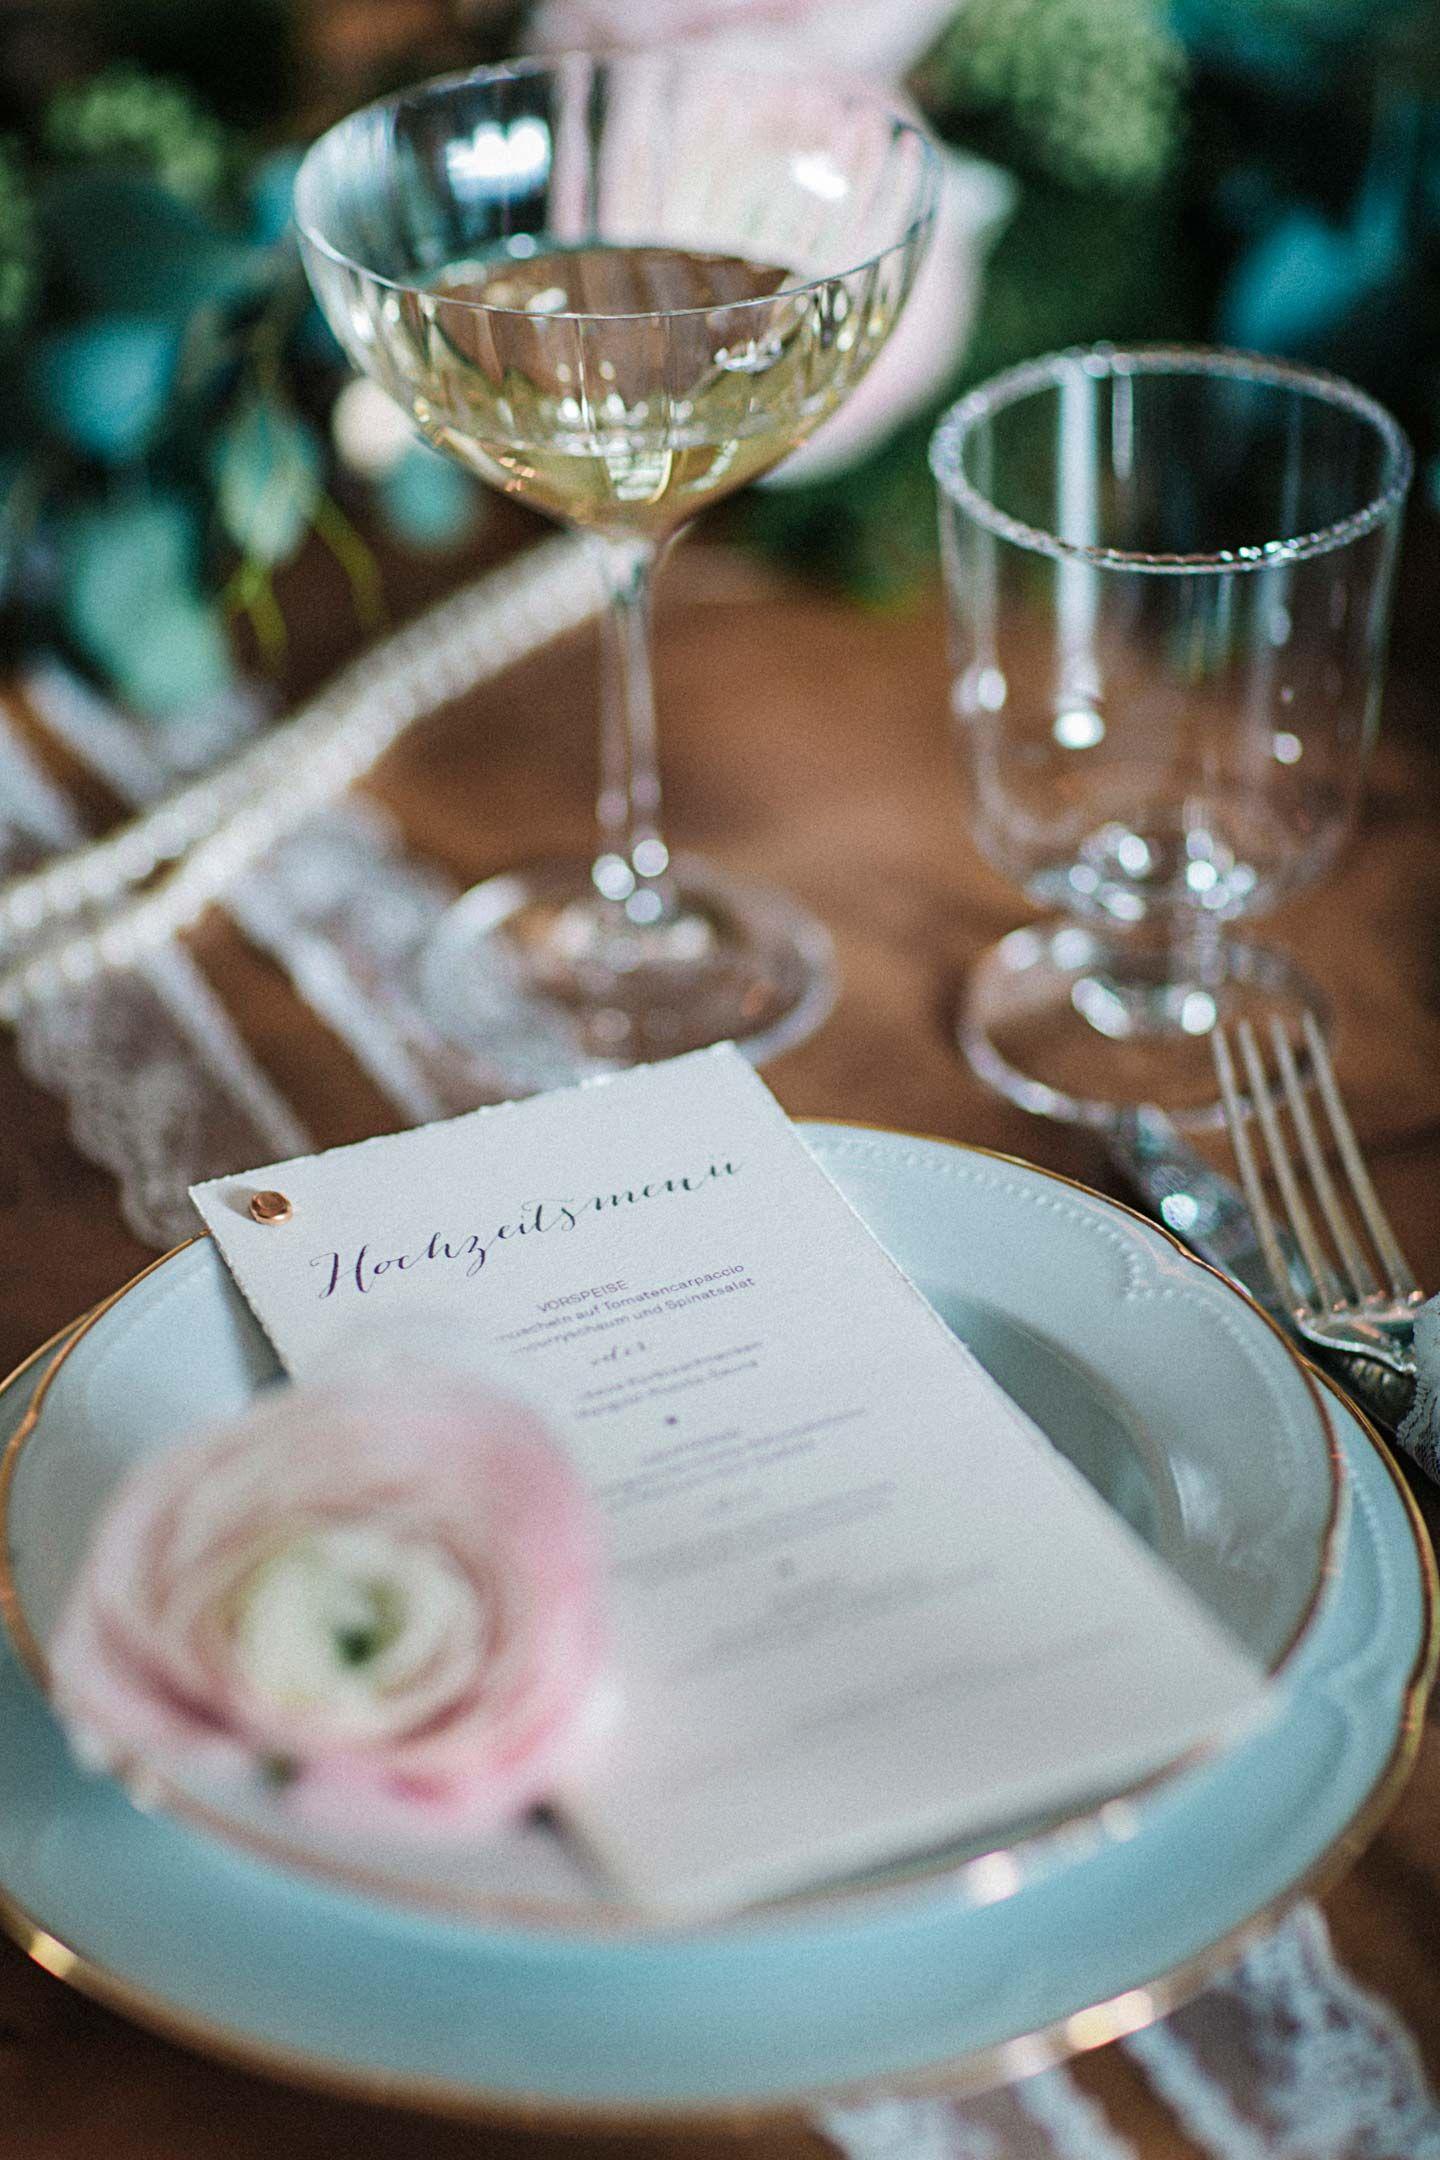 Glamouröse Nostalgie mit rosa Romantik | Romantik, Rosa